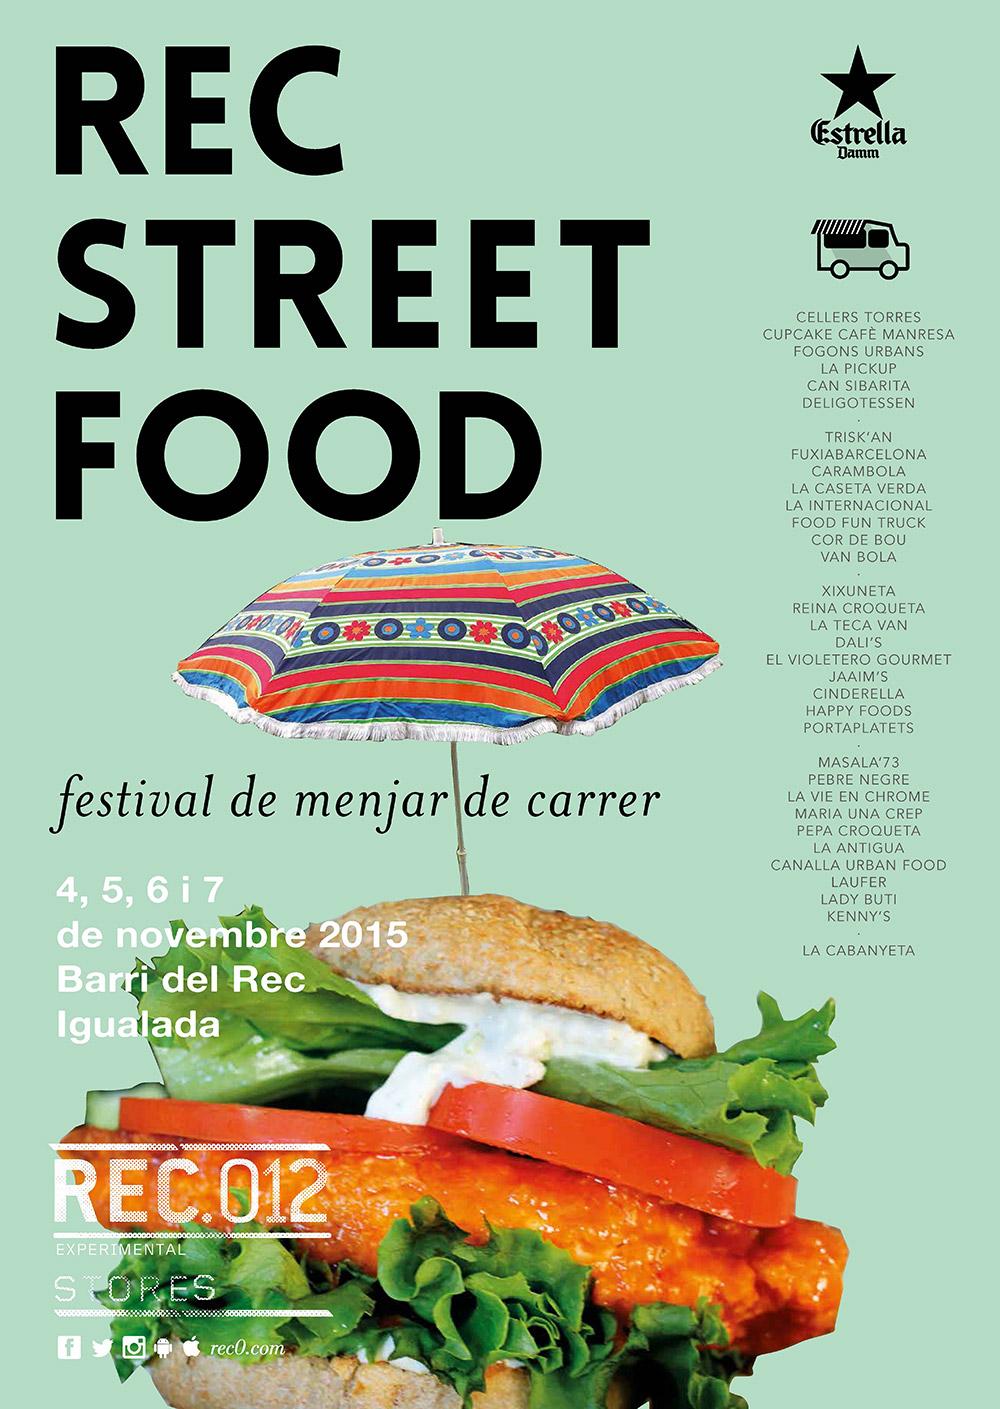 REC STREET FOOD 2015